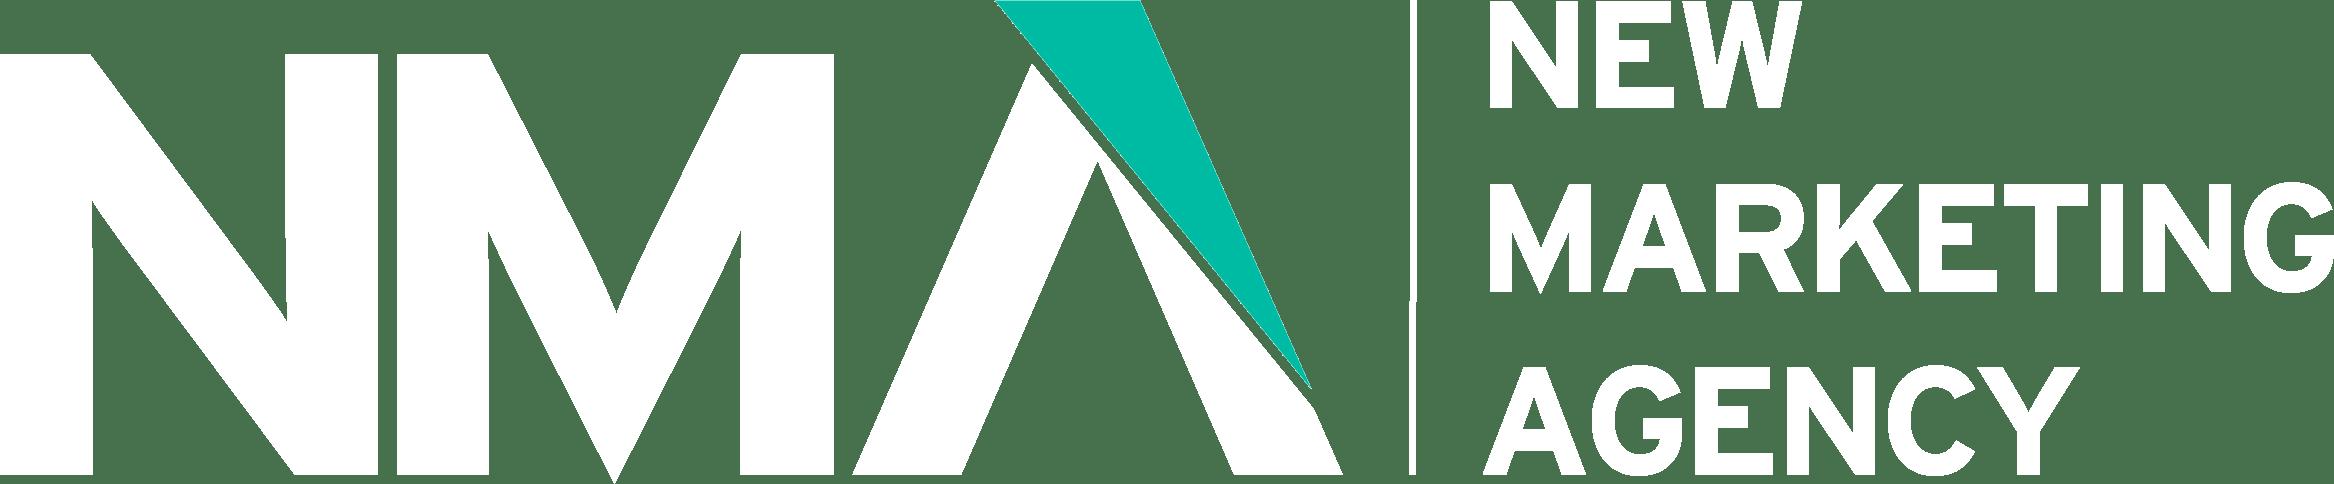 New Marketing Agency